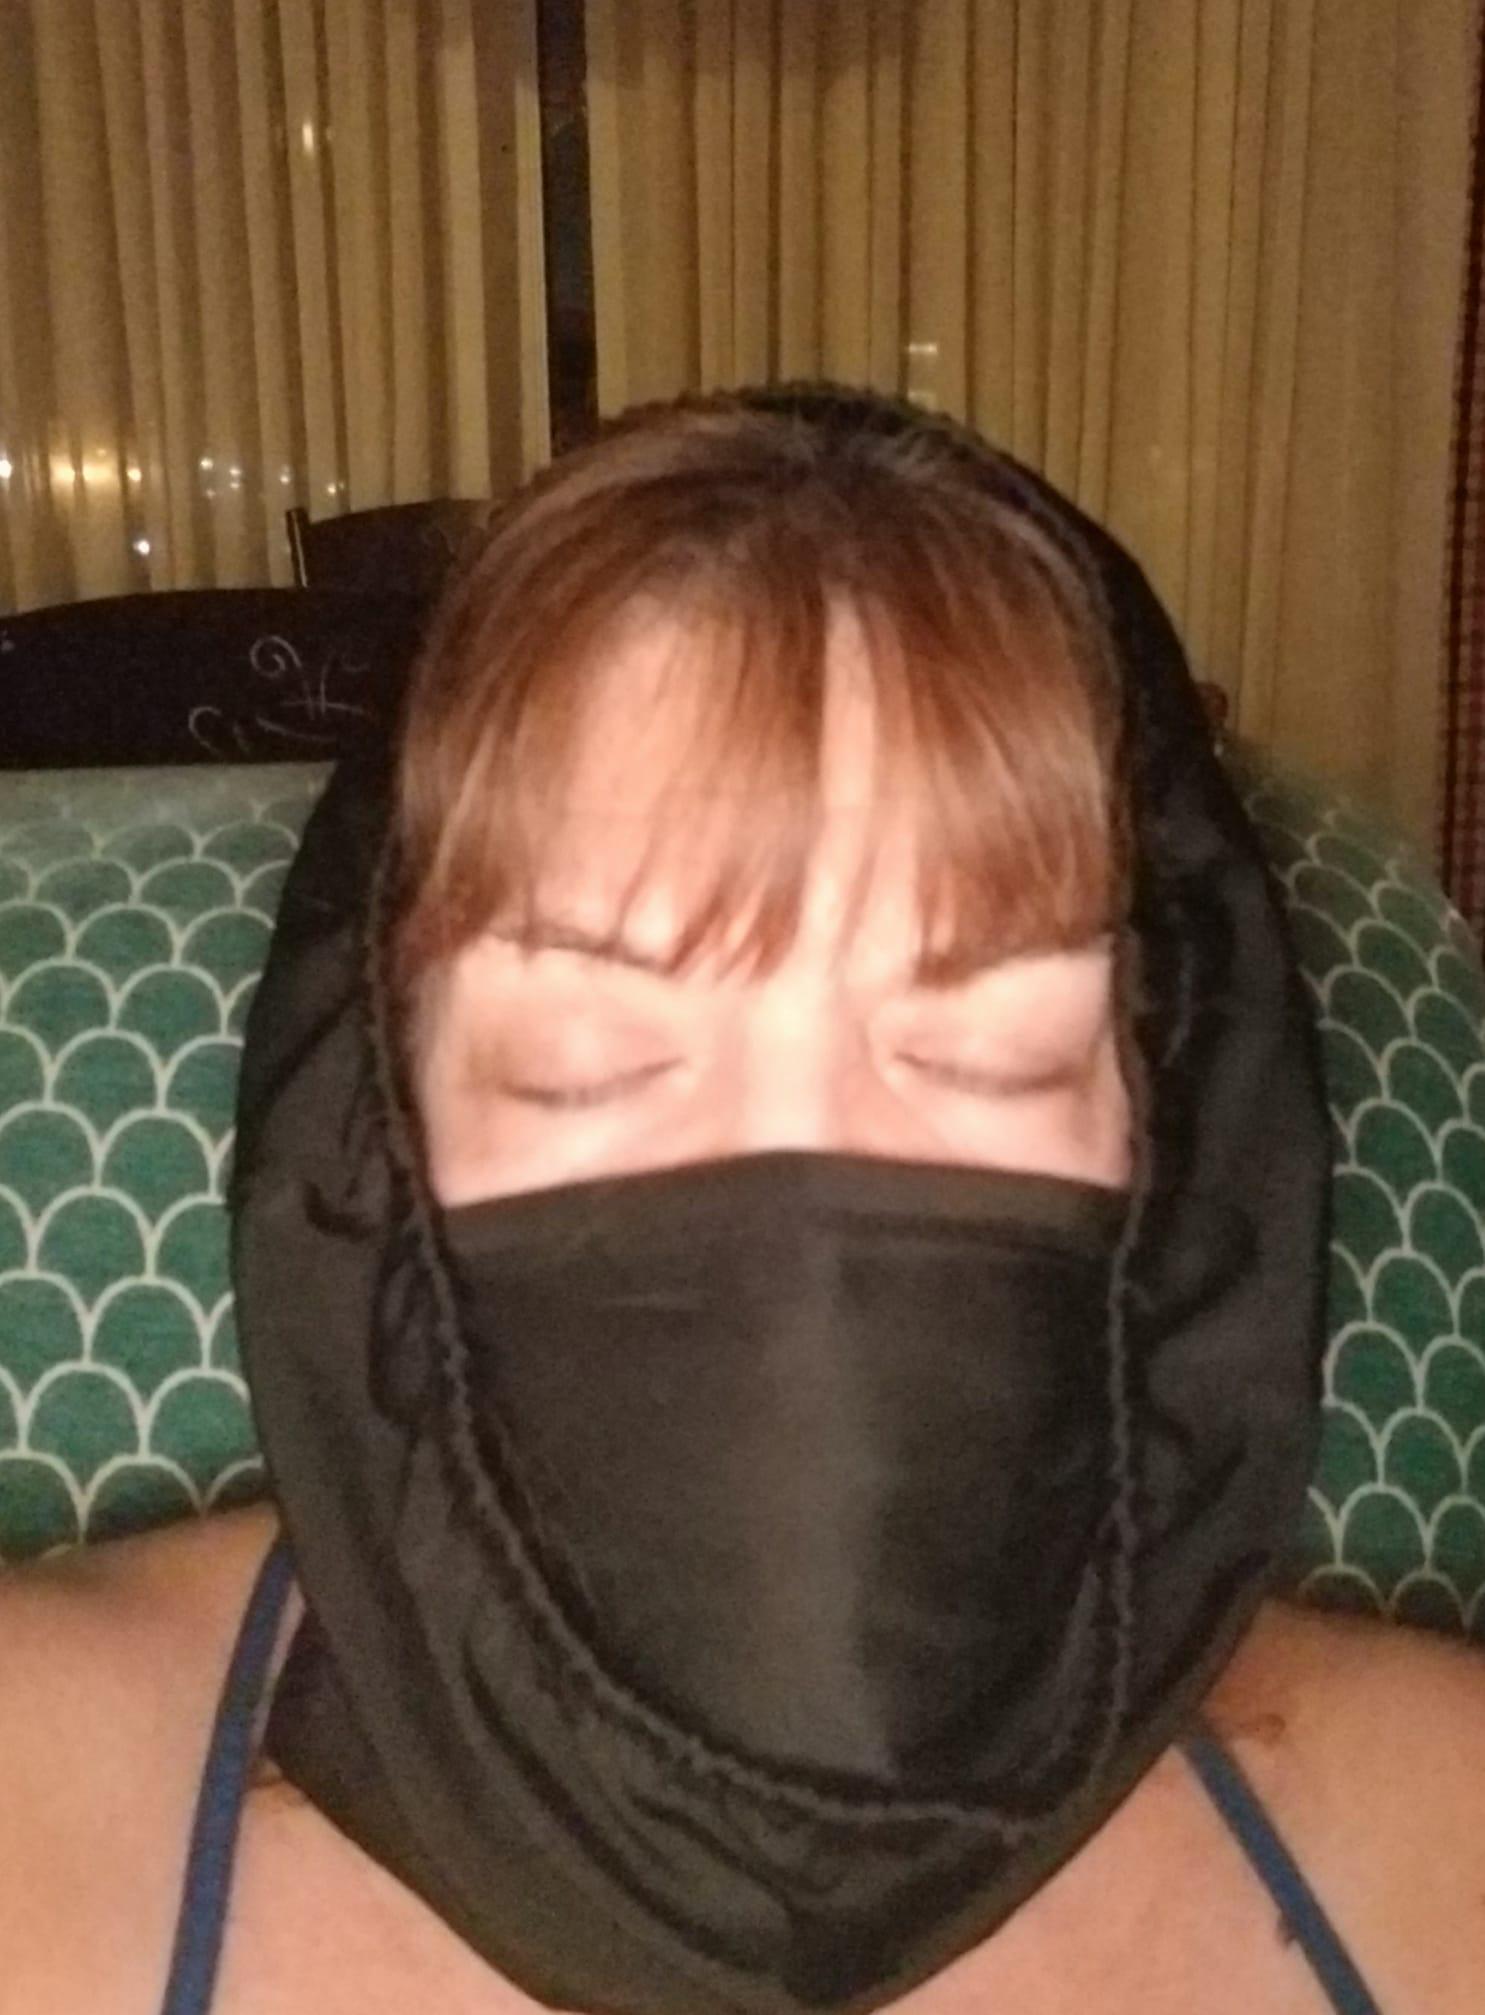 https://rhswyan60s.com/wp-content/uploads/2020/07/Barbara-Kolbe.jpg